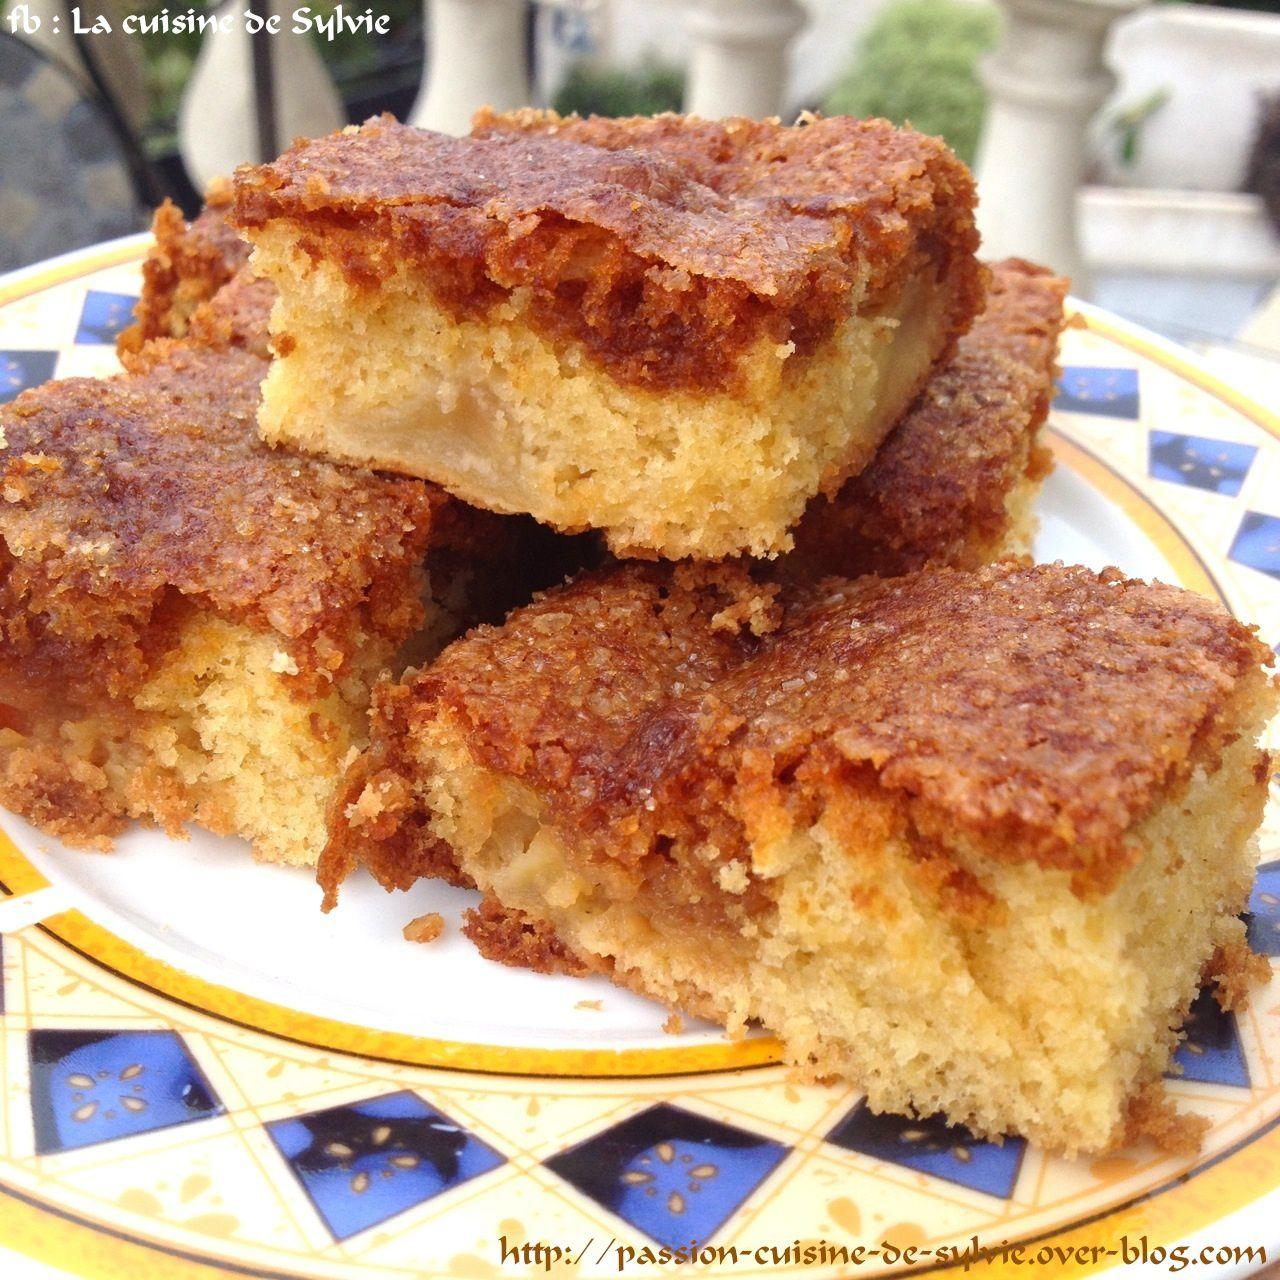 Gâteau aux pommes fondantes au rhum et sirop caramel / rhum